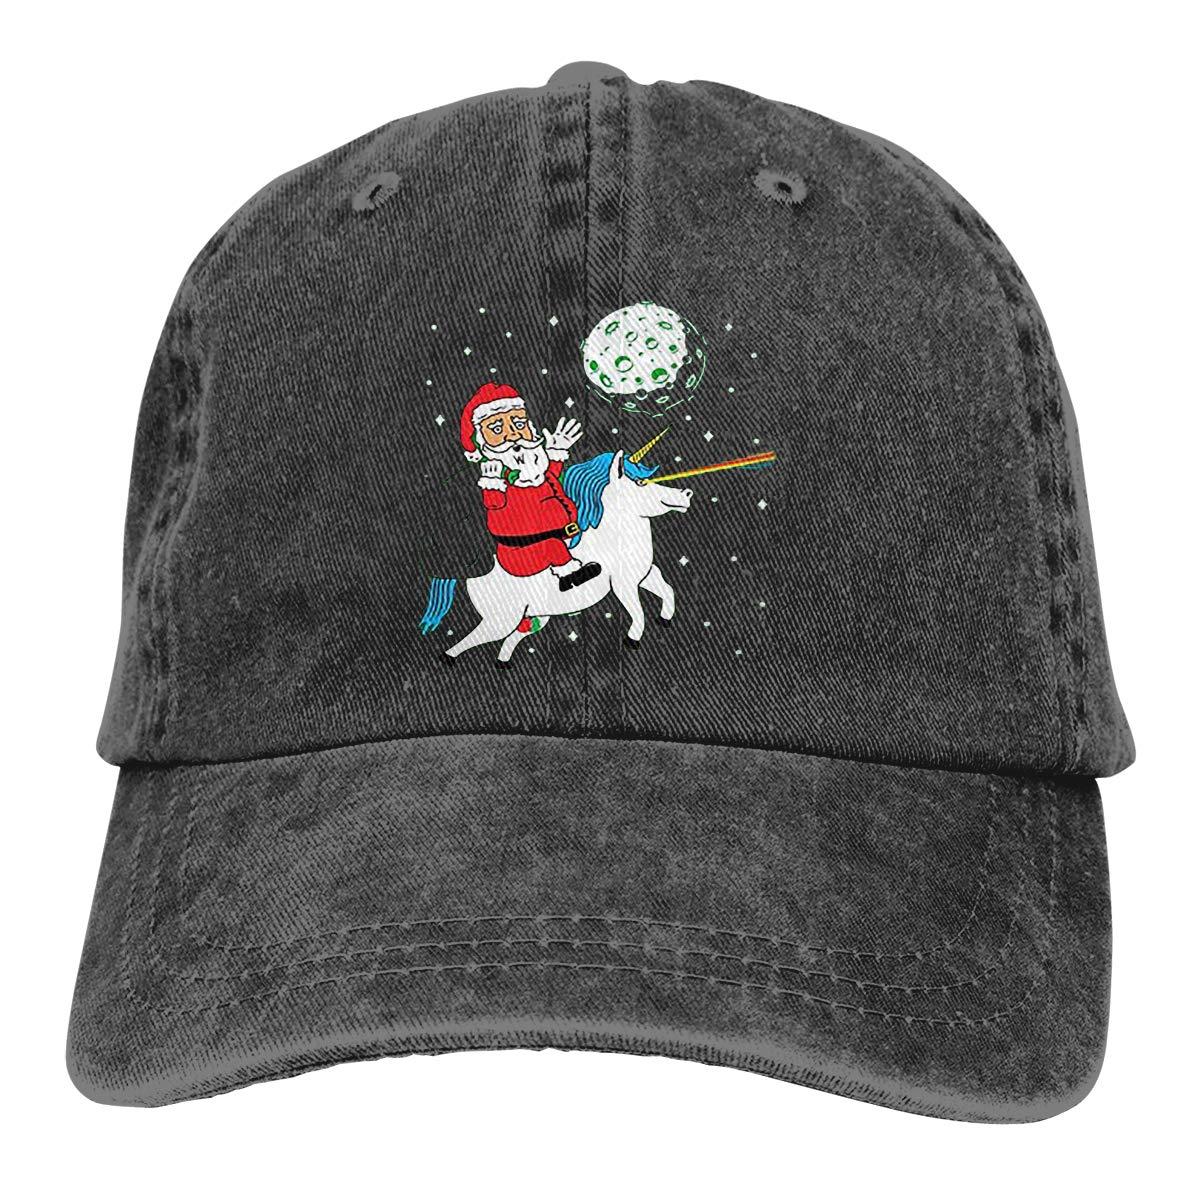 HU MOVR Santa Riding Cowboy Hat Baseball Hats Trucker Adjustable Cap for Mens Womens